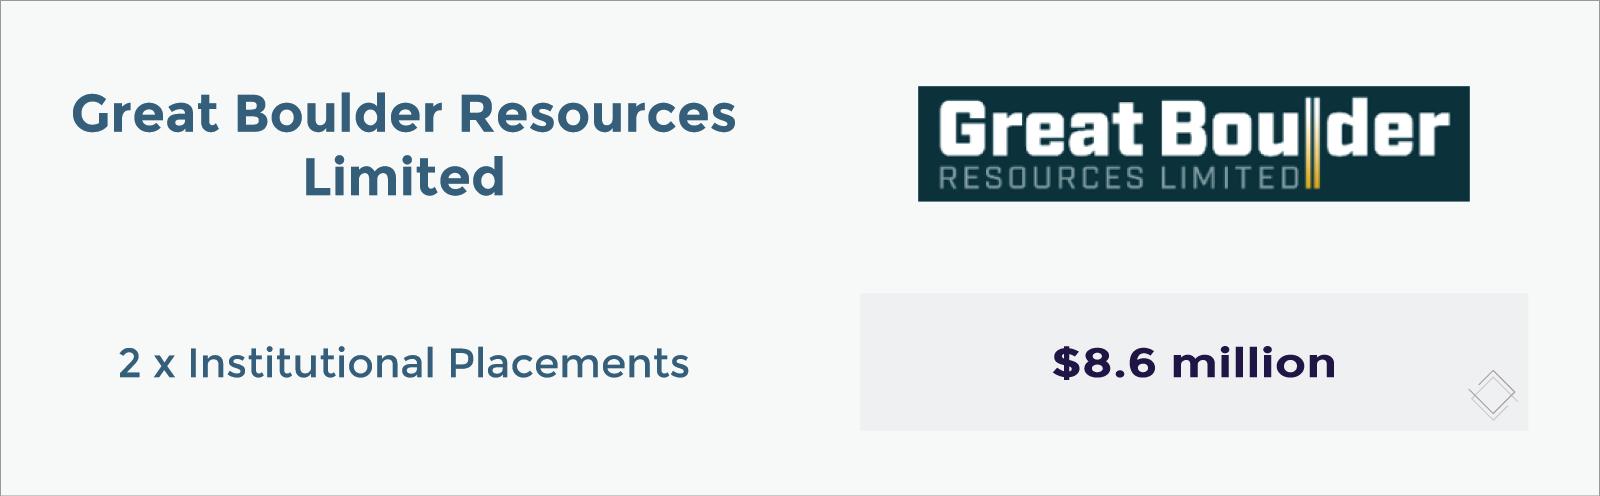 Great Boulder Resources